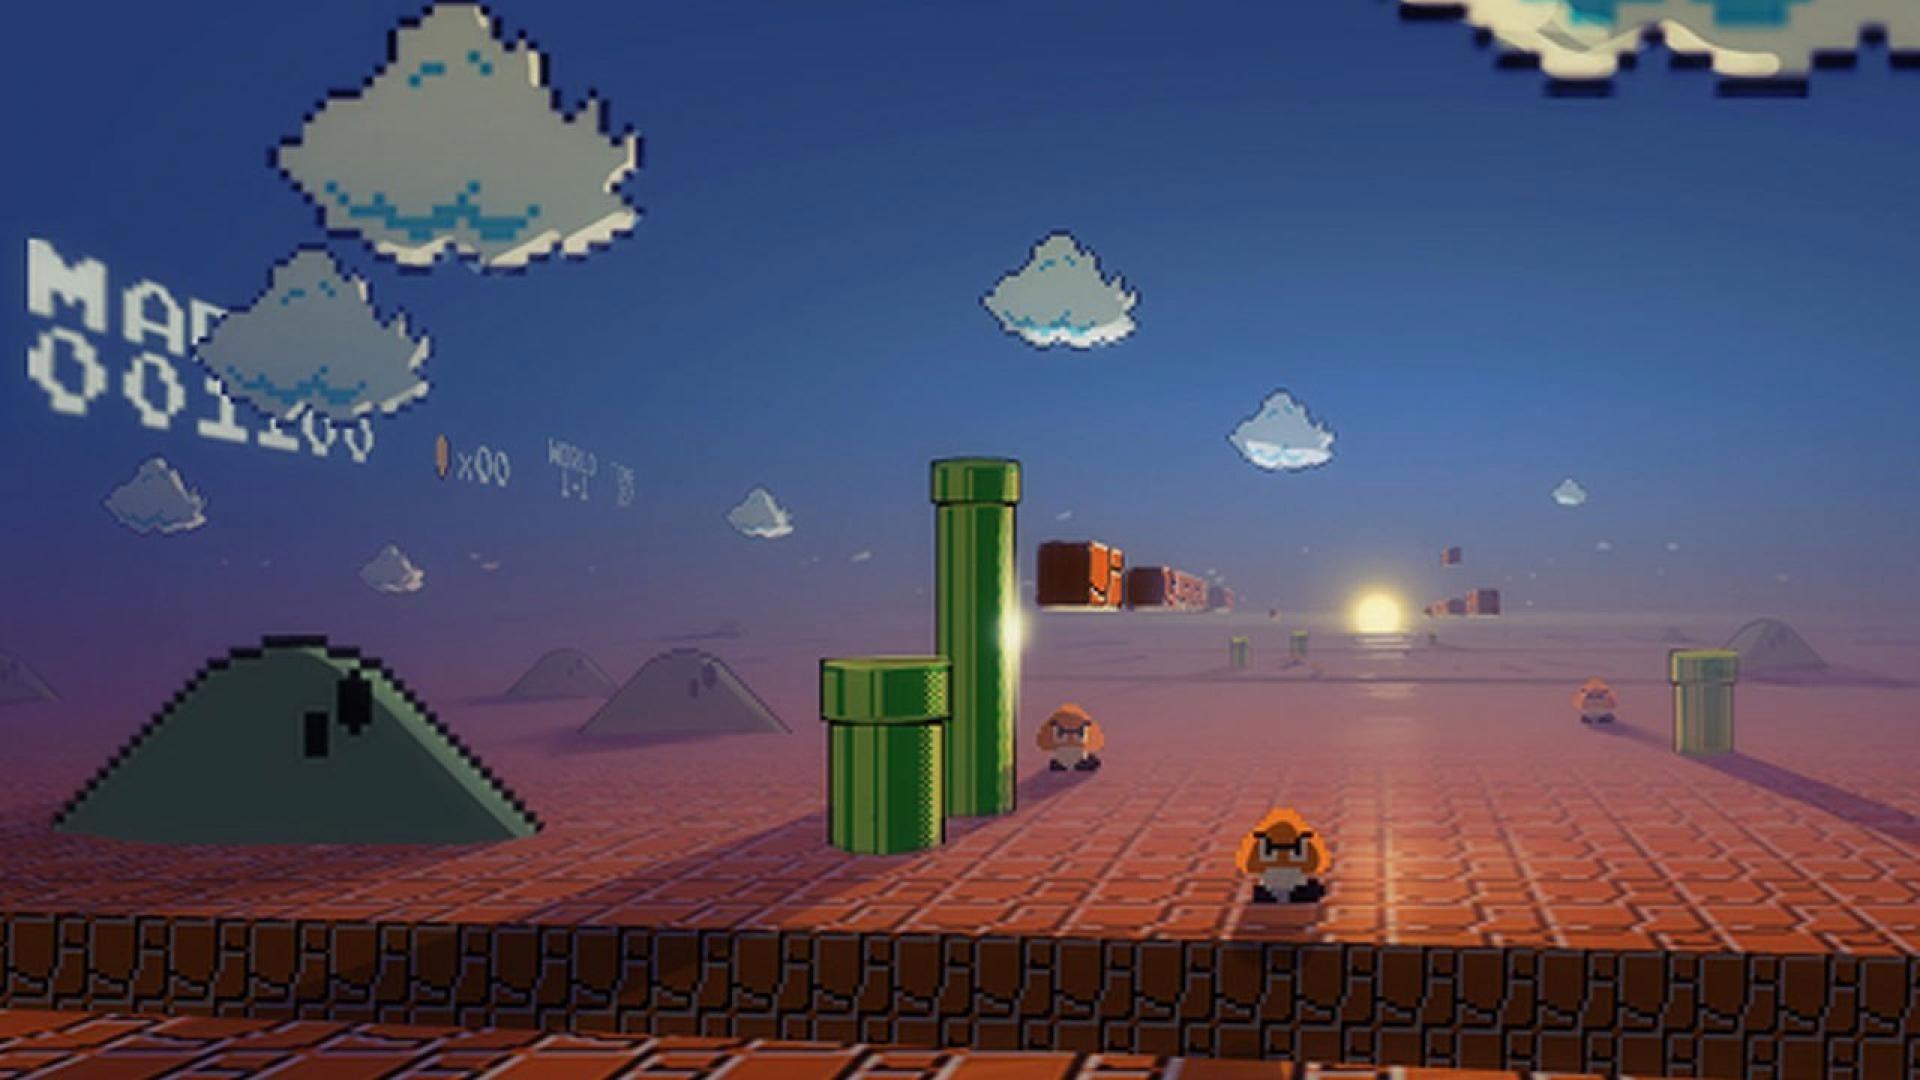 wallpaper.wiki-Free-Nintendo-Photos-PIC-WPE002254